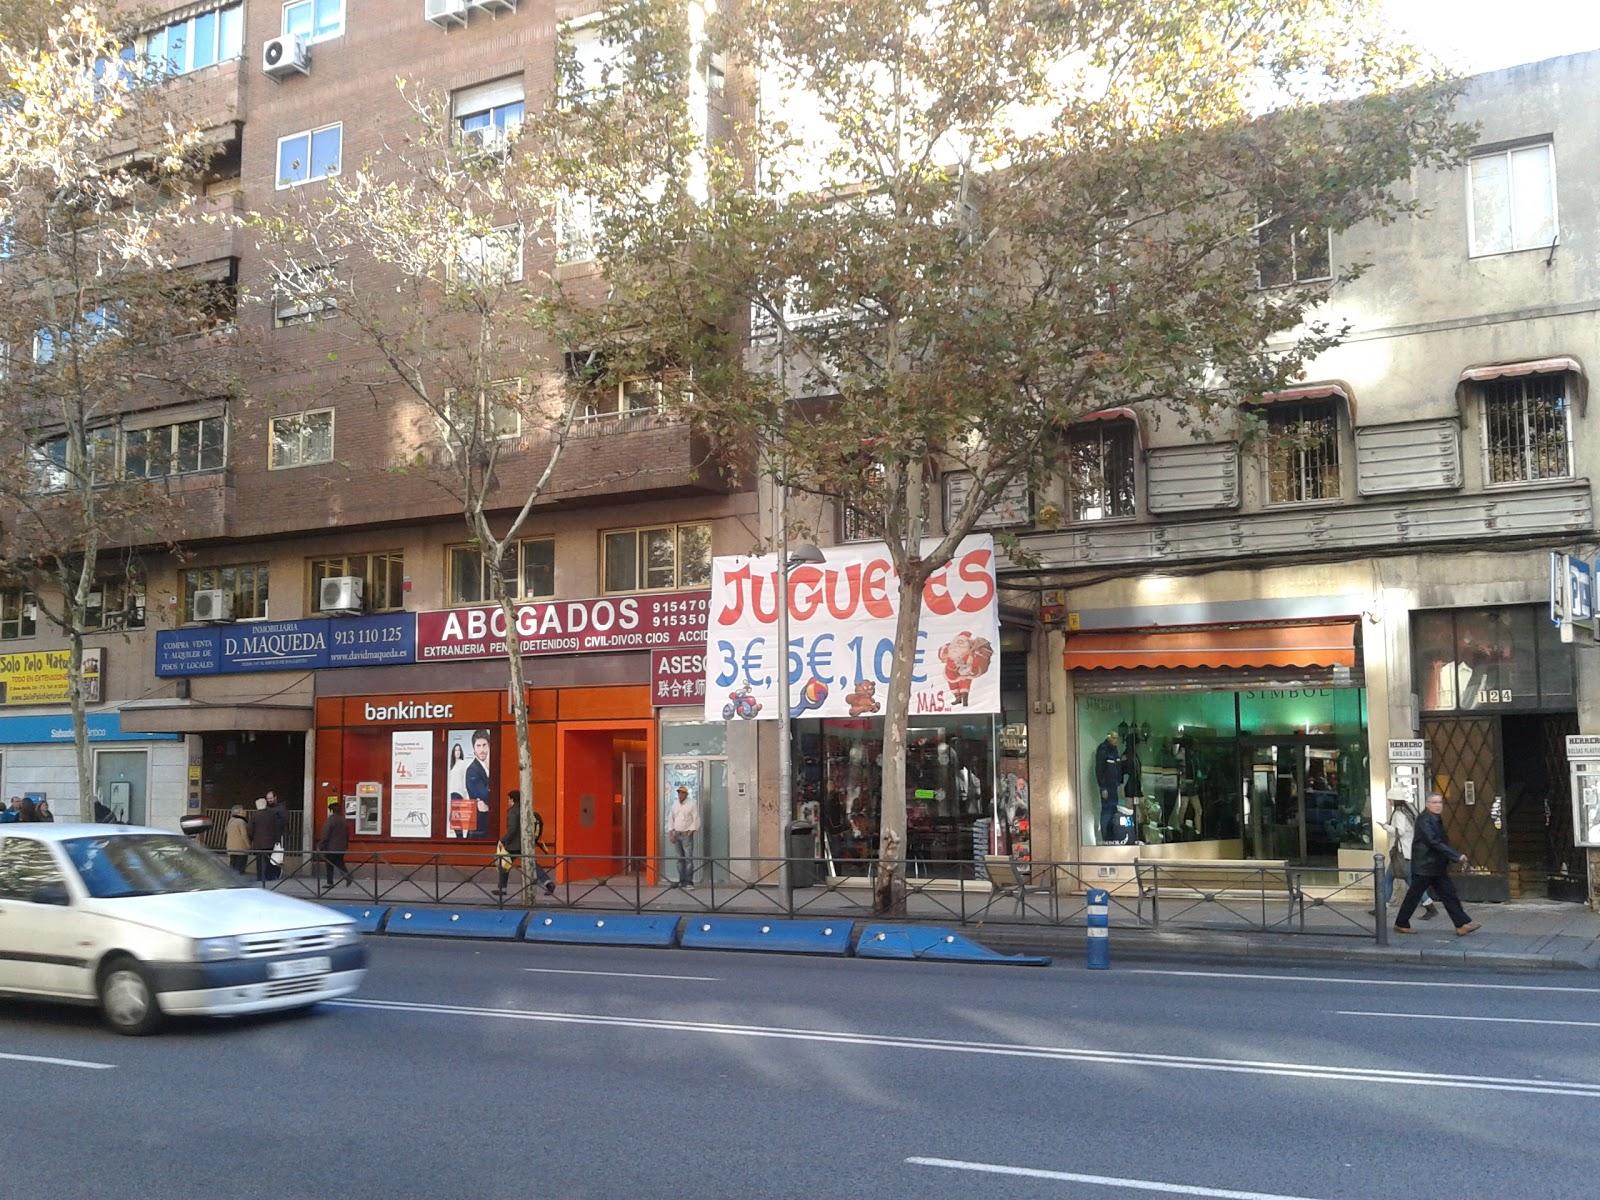 Nosolometro juguetes baratos a 10 euros madrid navidad - Local en madrid ...